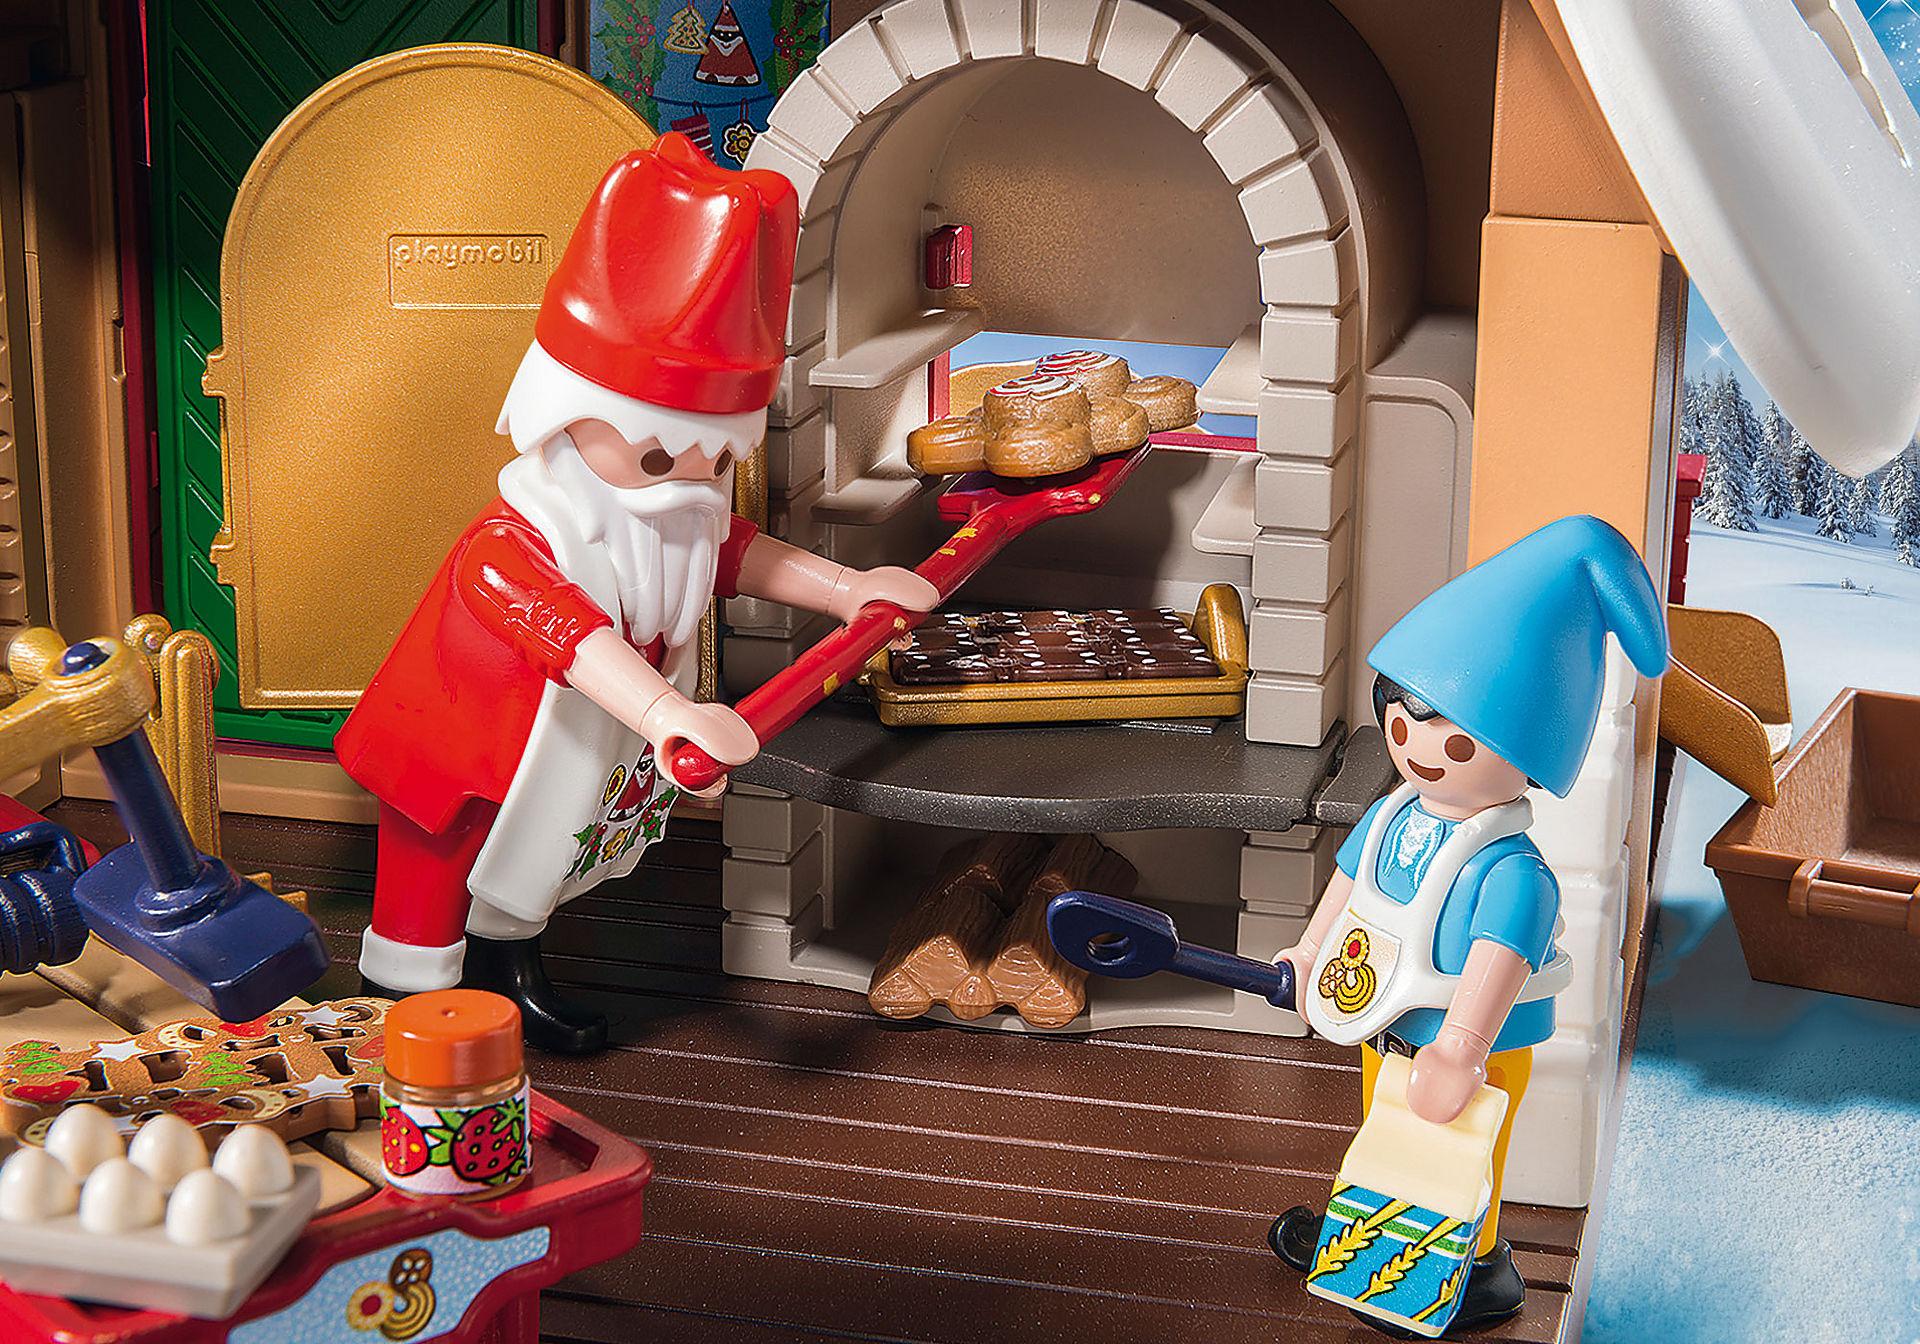 http://media.playmobil.com/i/playmobil/9493_product_extra1/Kerstbakkerij met koekjesvormen